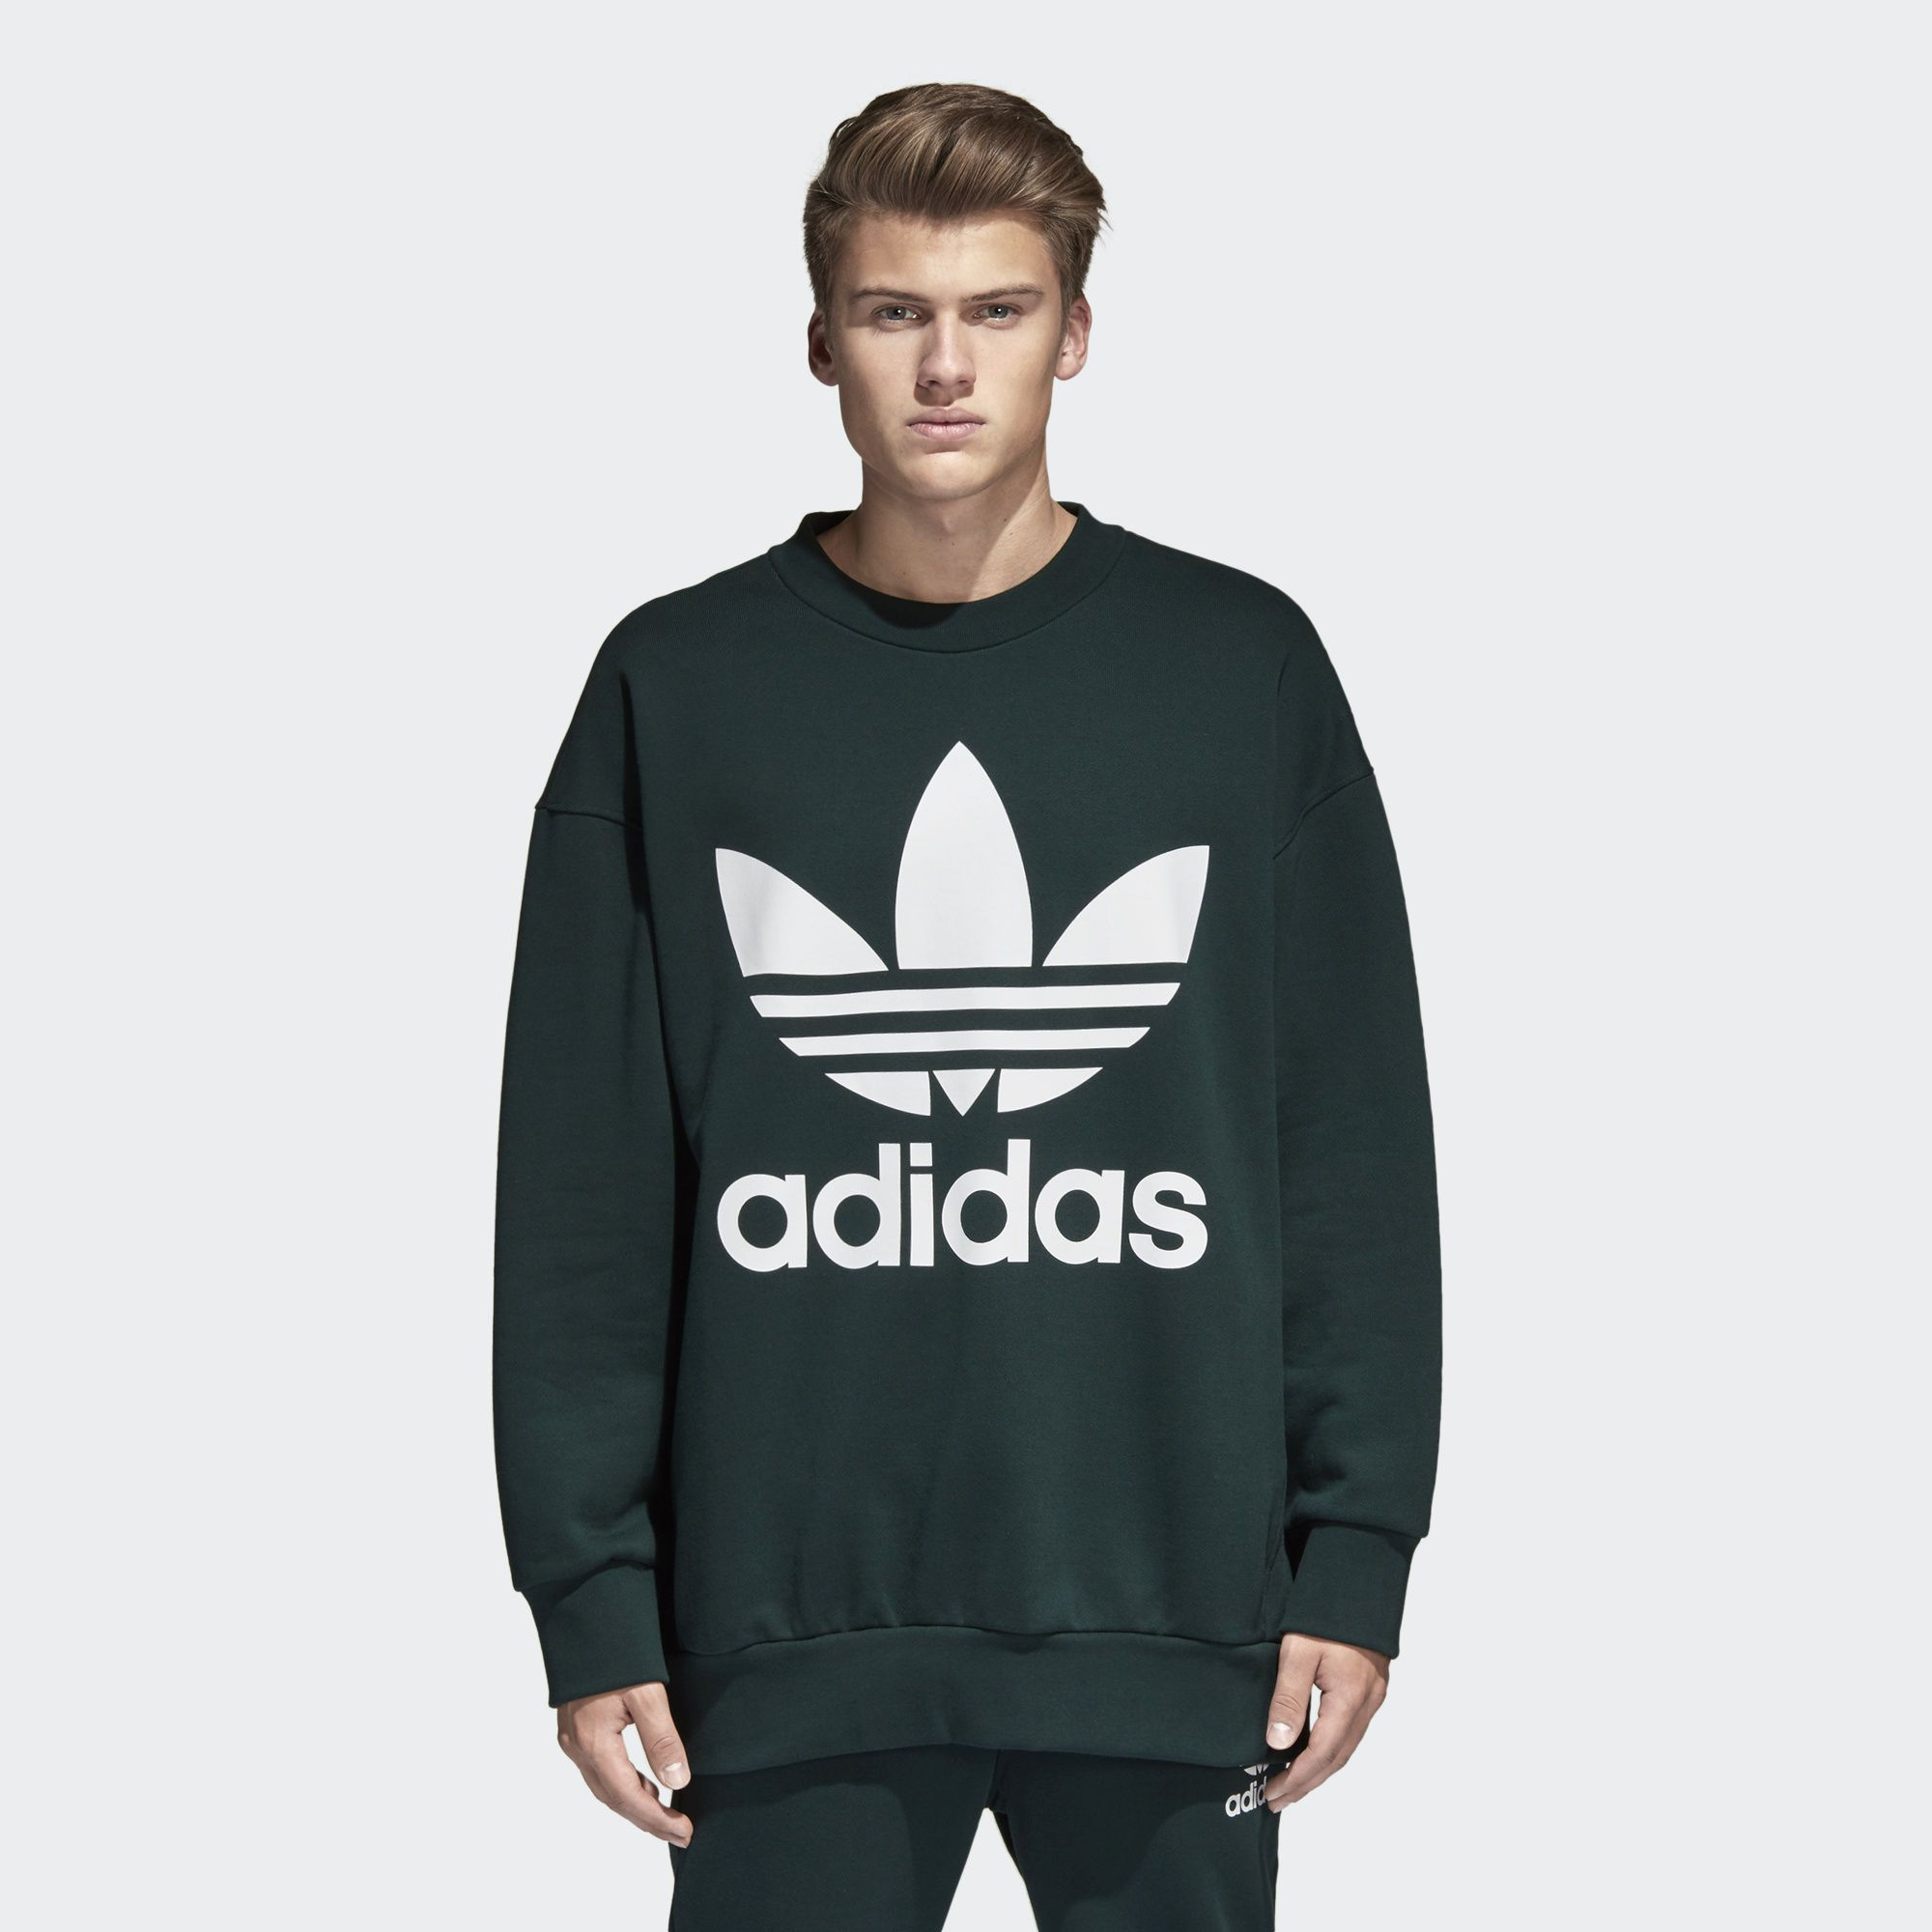 Transforming A Basic Essential Into A Modern Fashion Forward Design This Men S Sweatshirt Is Crafted Of Soft Prem Adidas Sweater Mens Sweatshirts Sweatshirts [ 2000 x 2000 Pixel ]